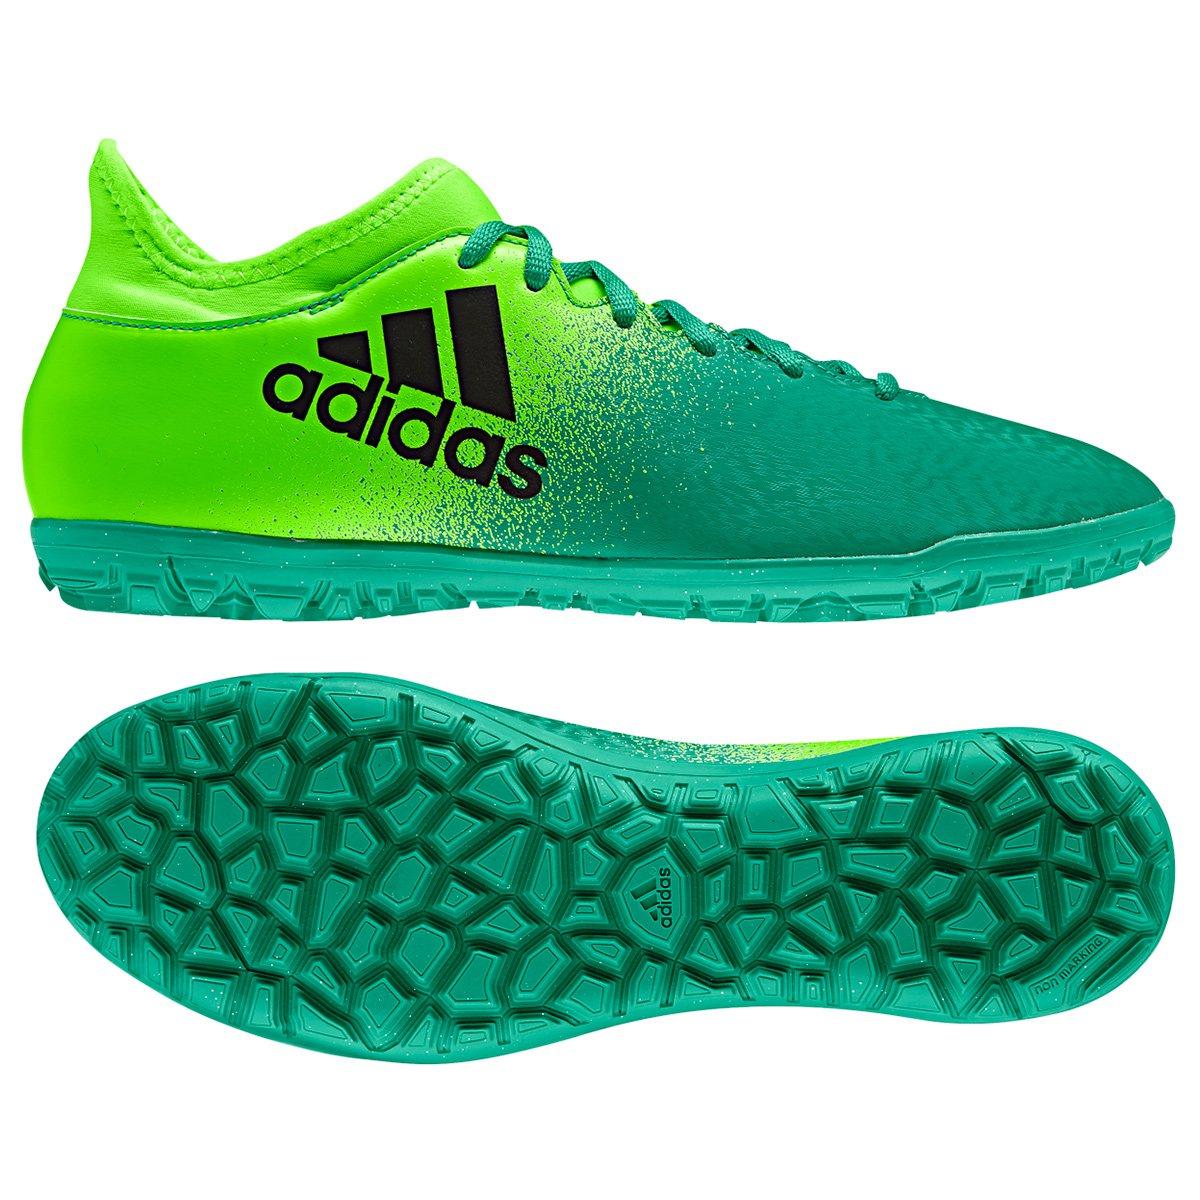 1d51dc35f ... chuteira society adidas x 16.3 tf masculina verde+preto